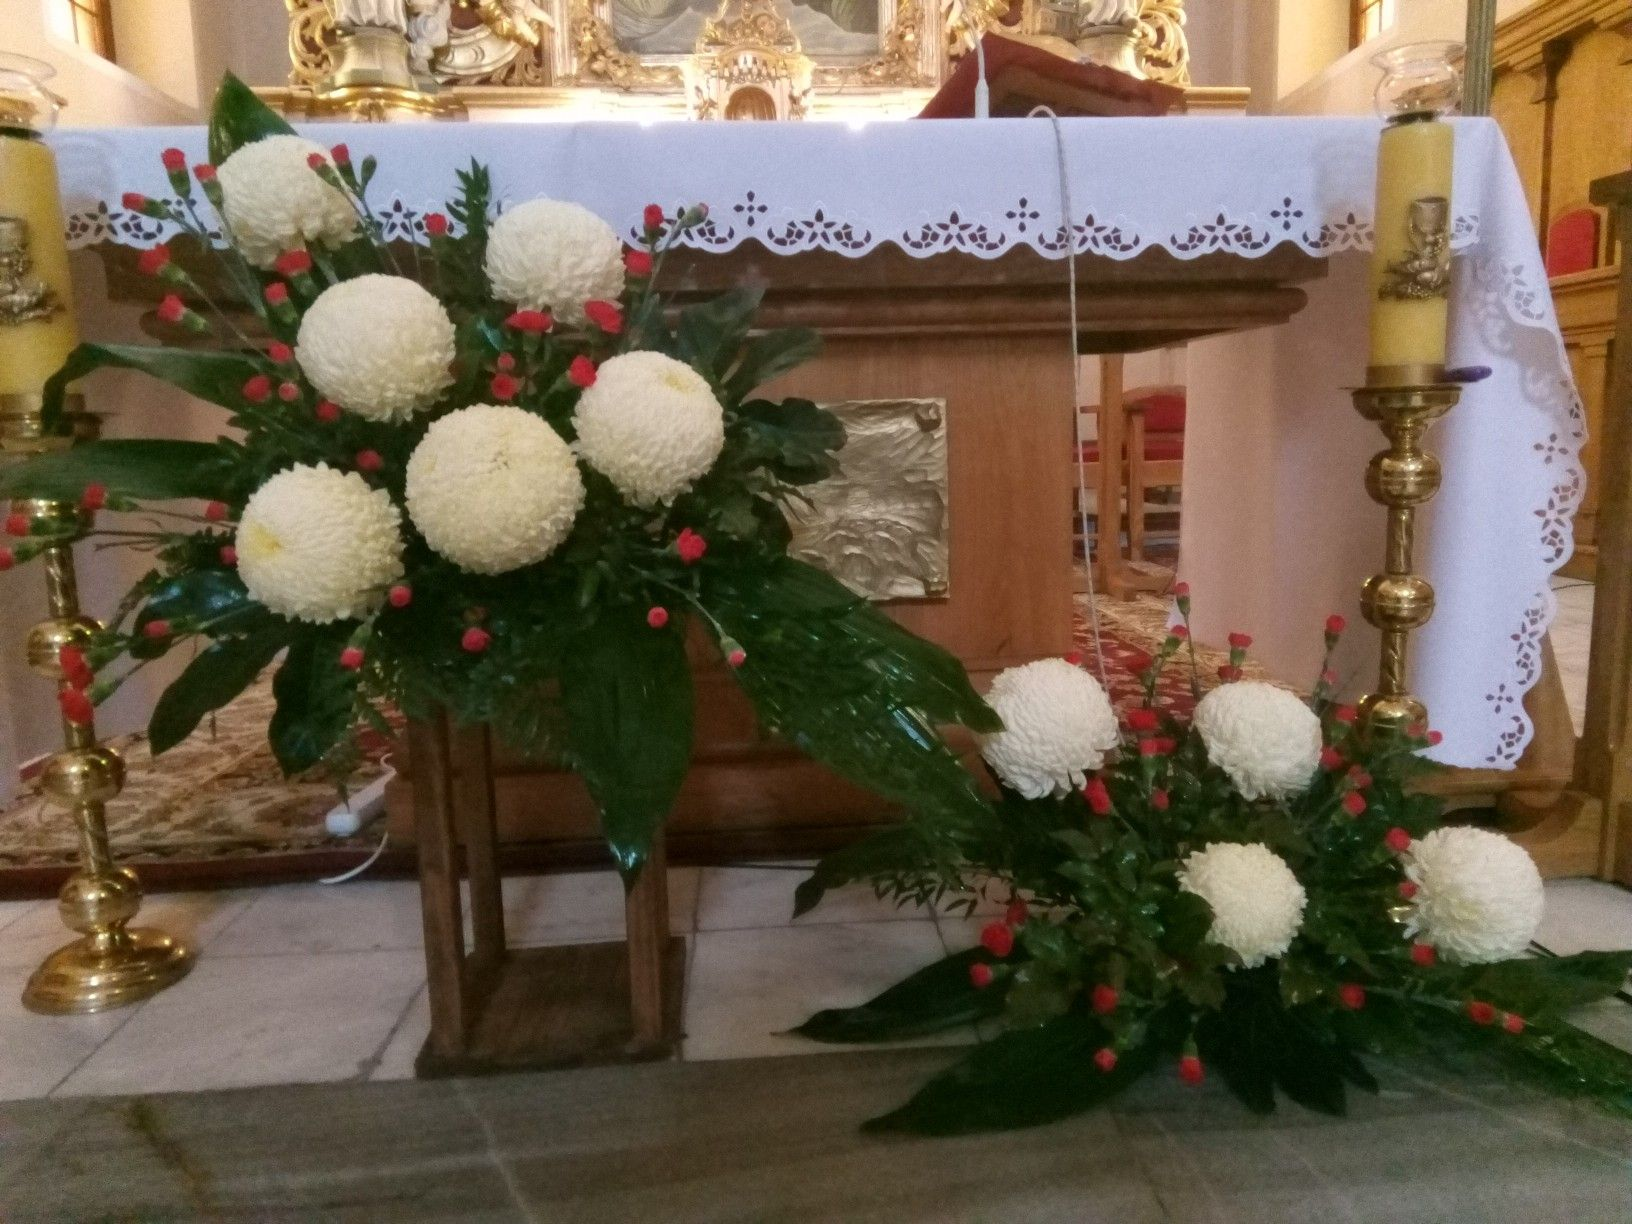 1 Listopad 2019 Altar Decorations Flower Arrangements Christmas Wreaths